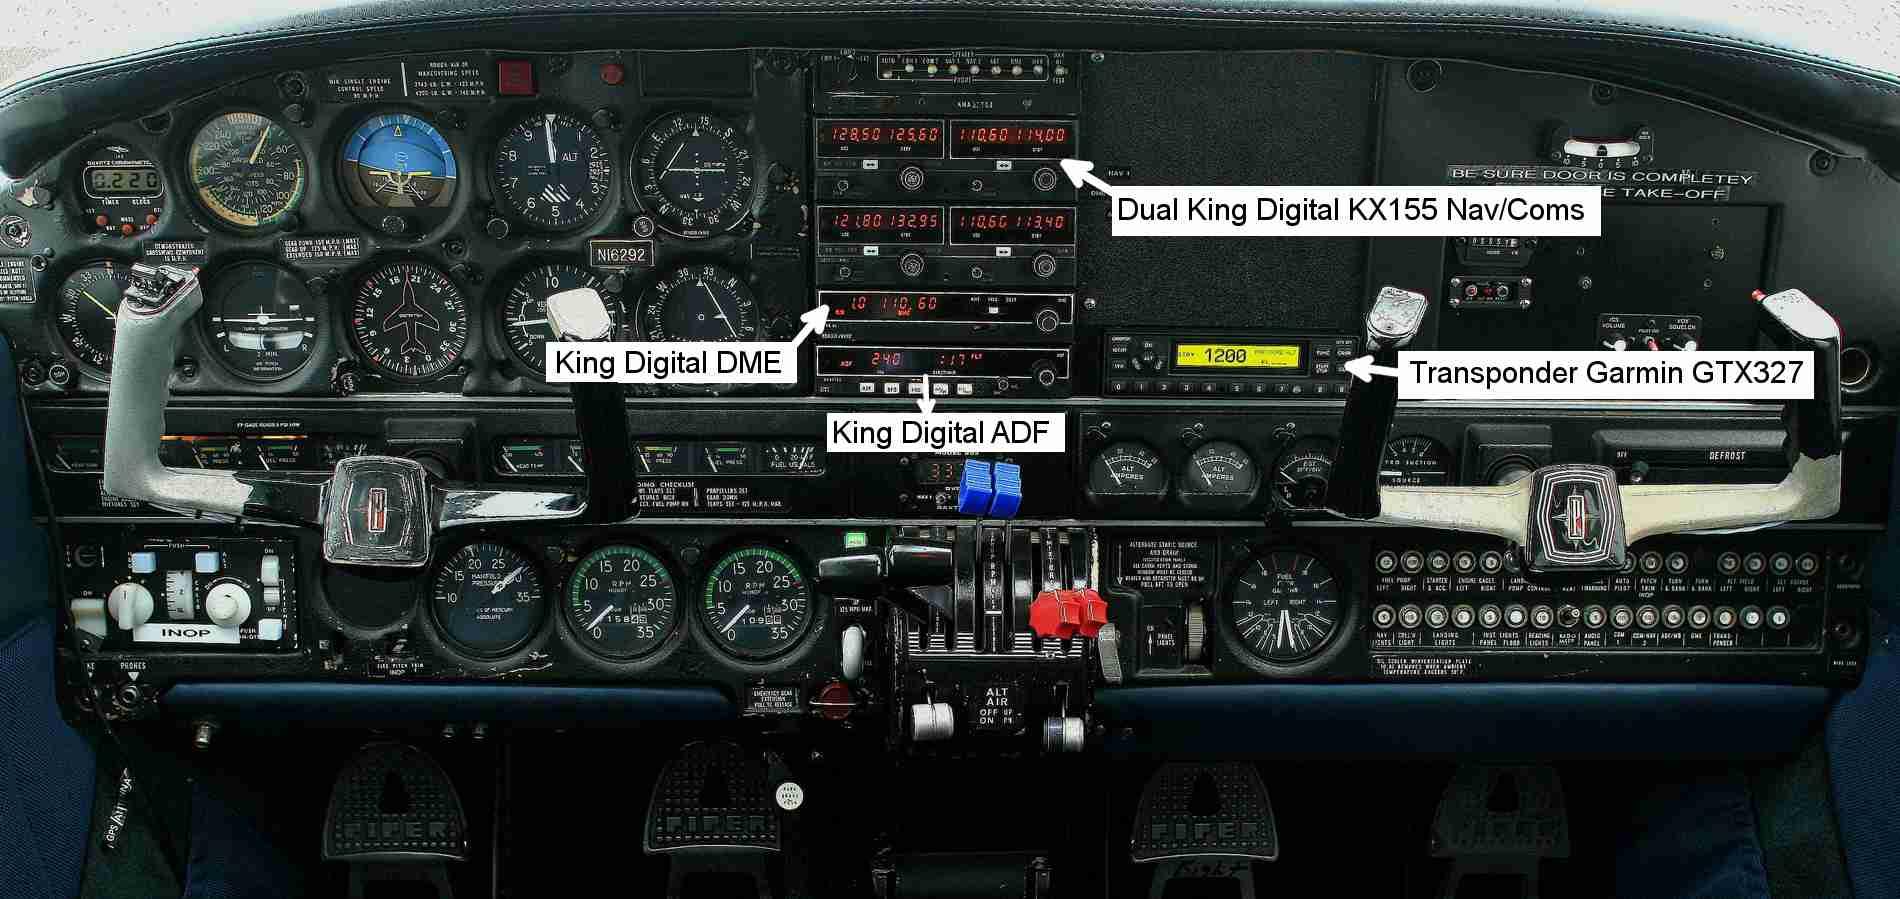 Trane X1379088401 Installation Operation And Maintenance